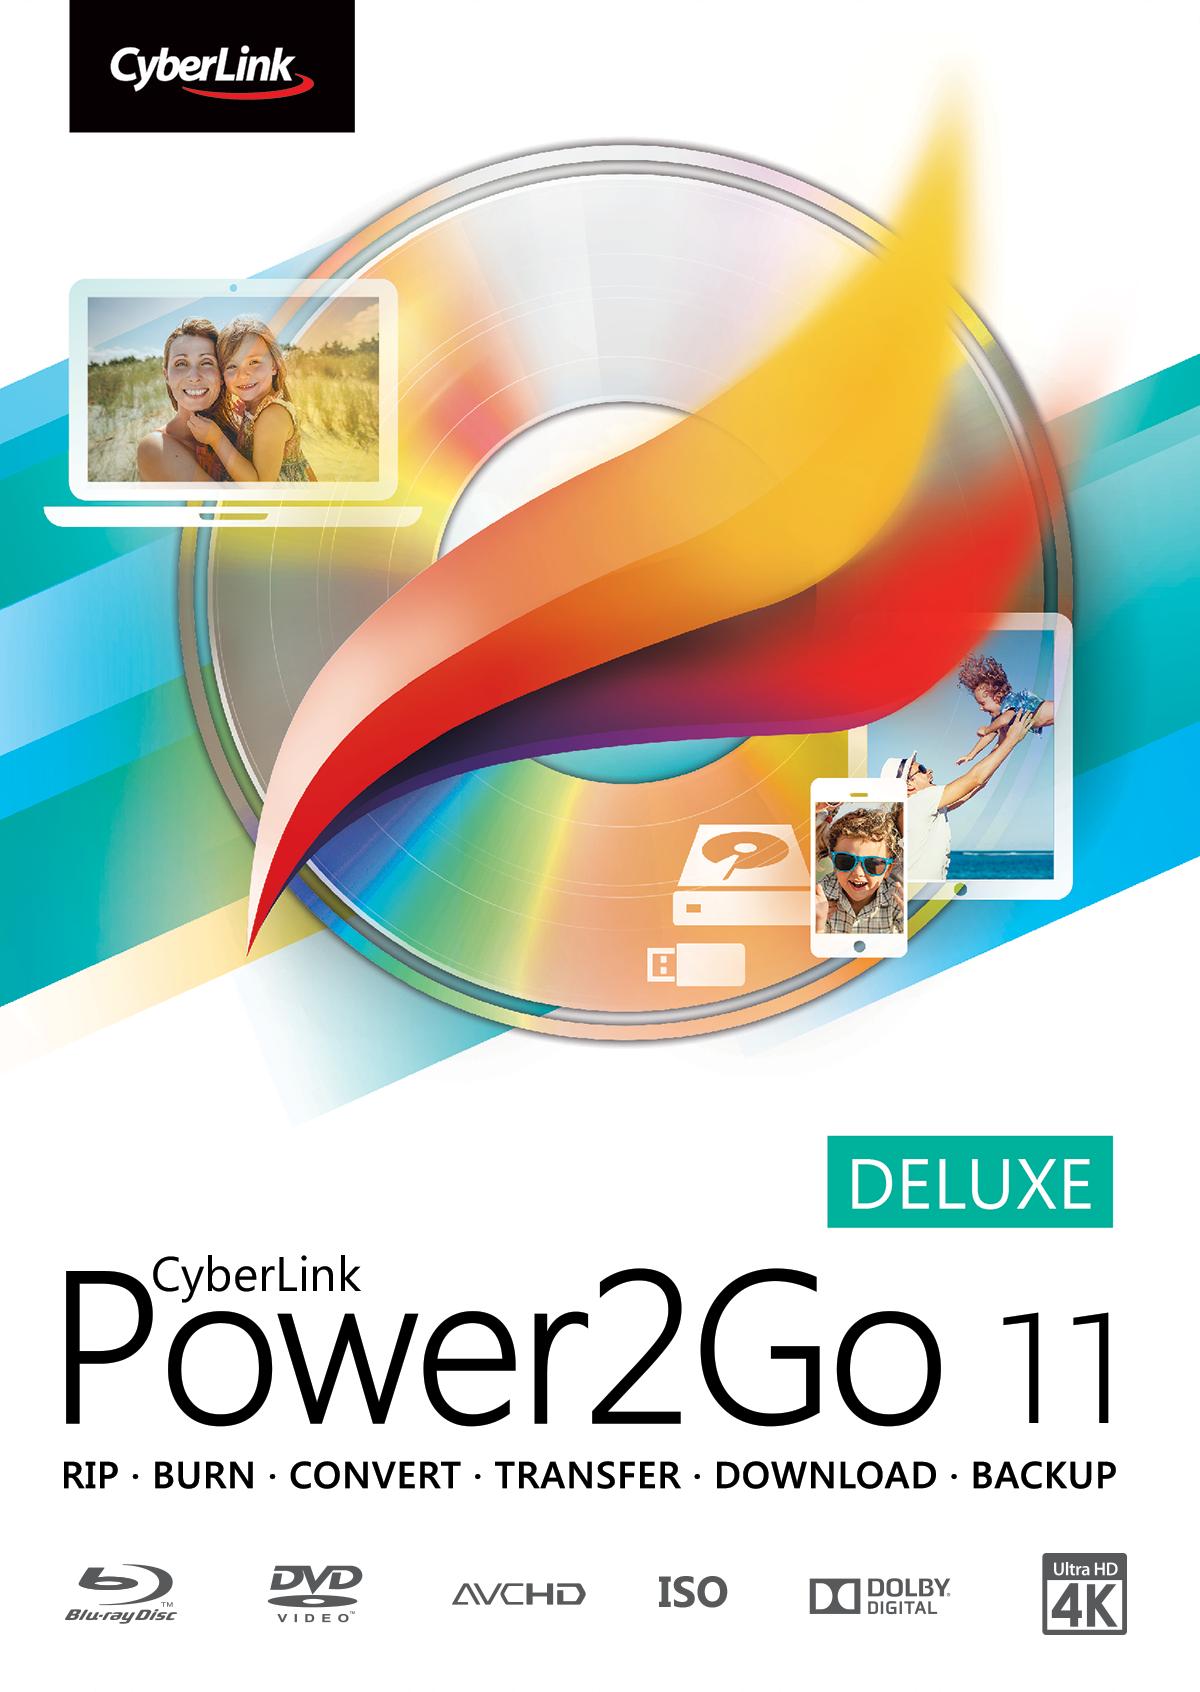 Cyberlink power2go 7 deluxe 2011 pc